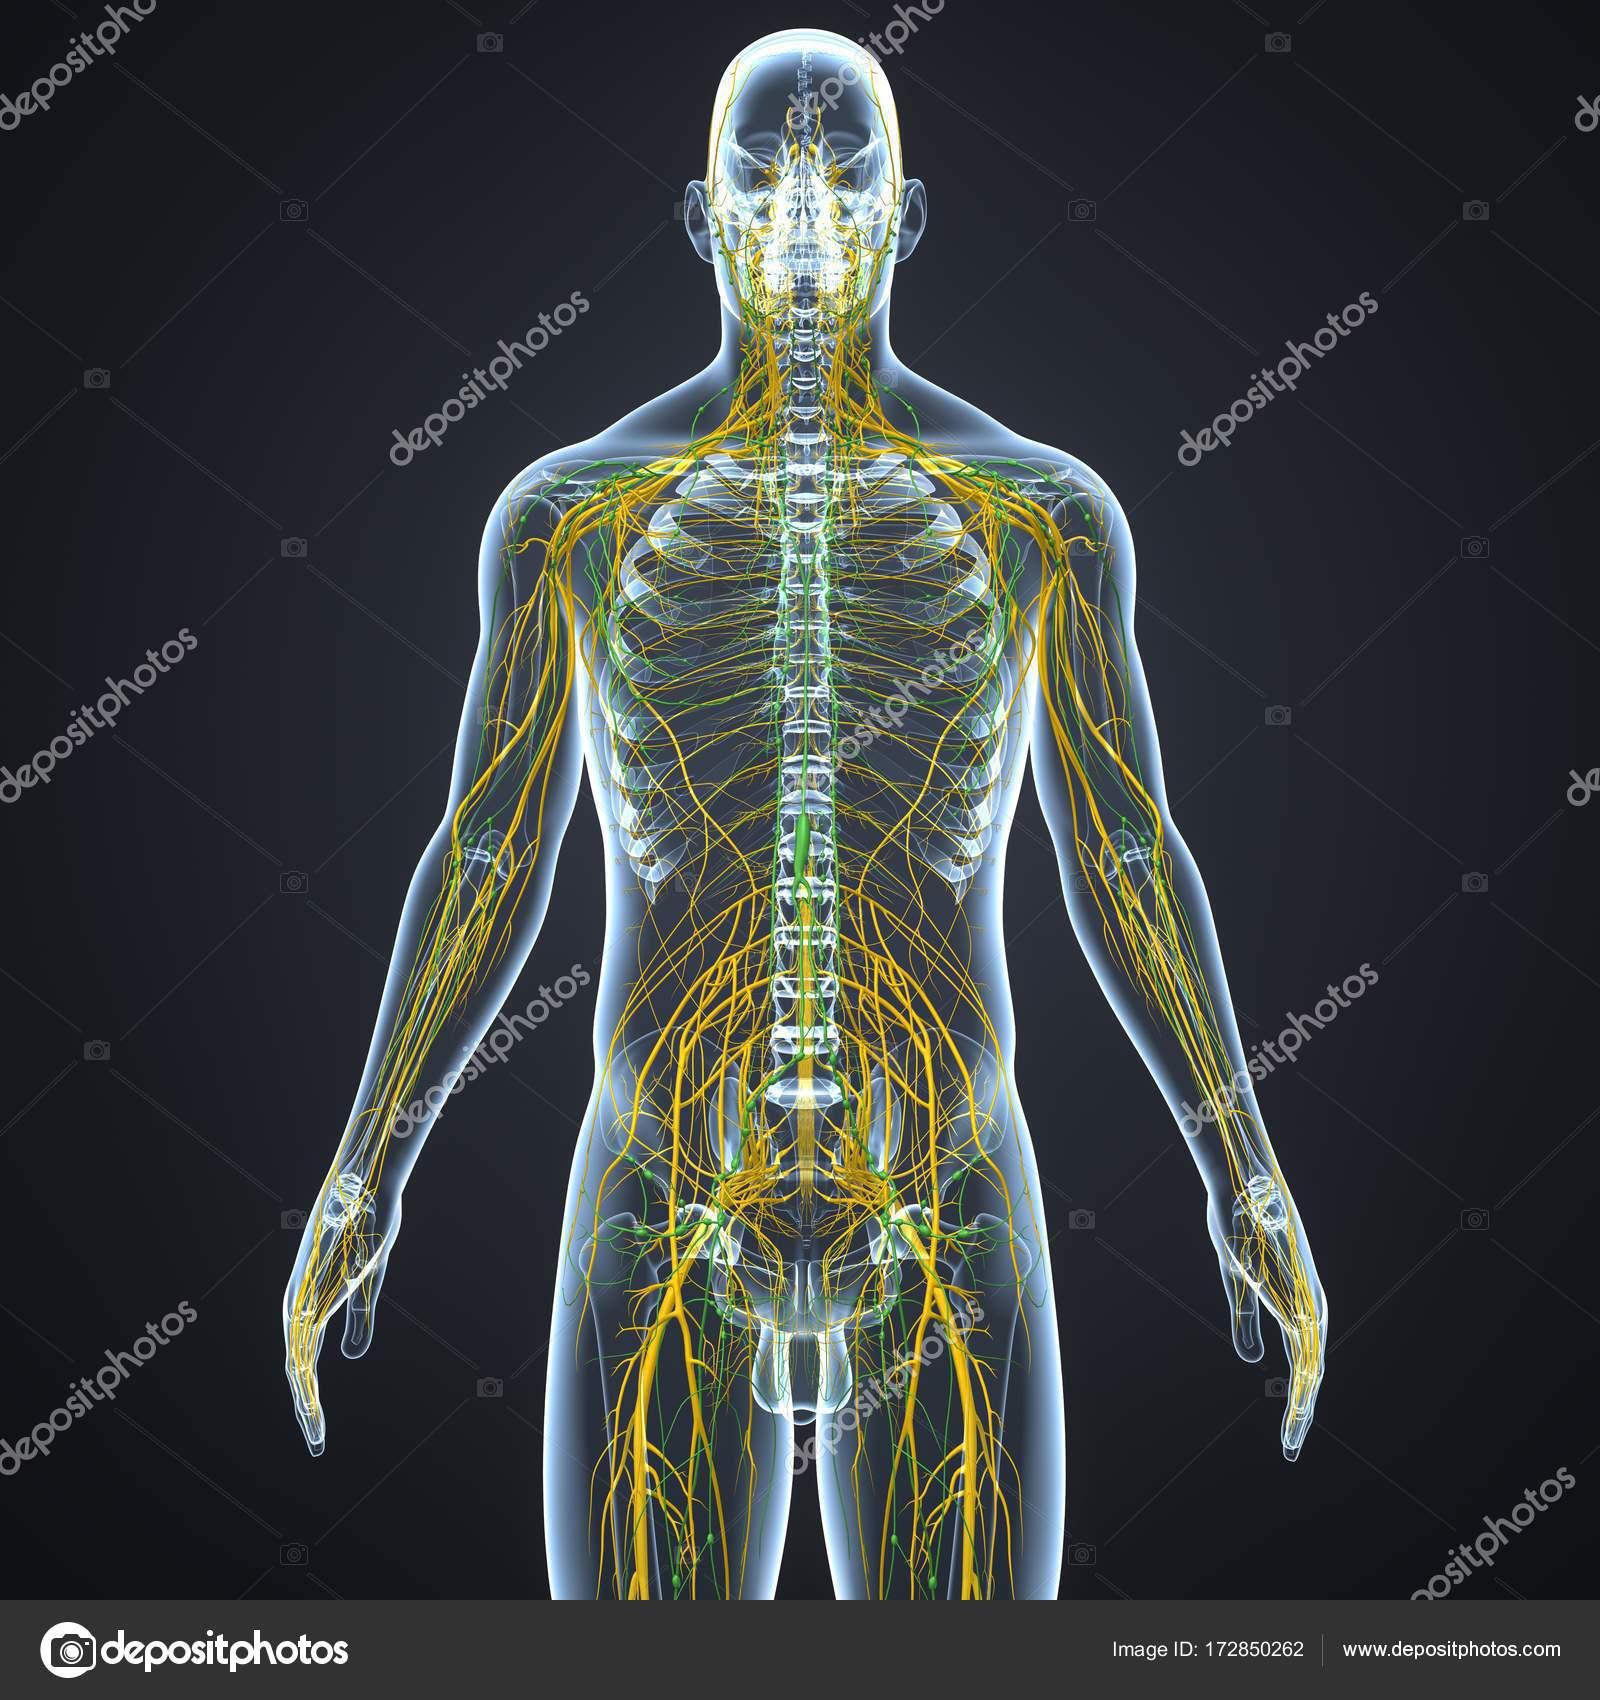 Nerven und Lymphknoten — Stockfoto © sciencepics #172850262